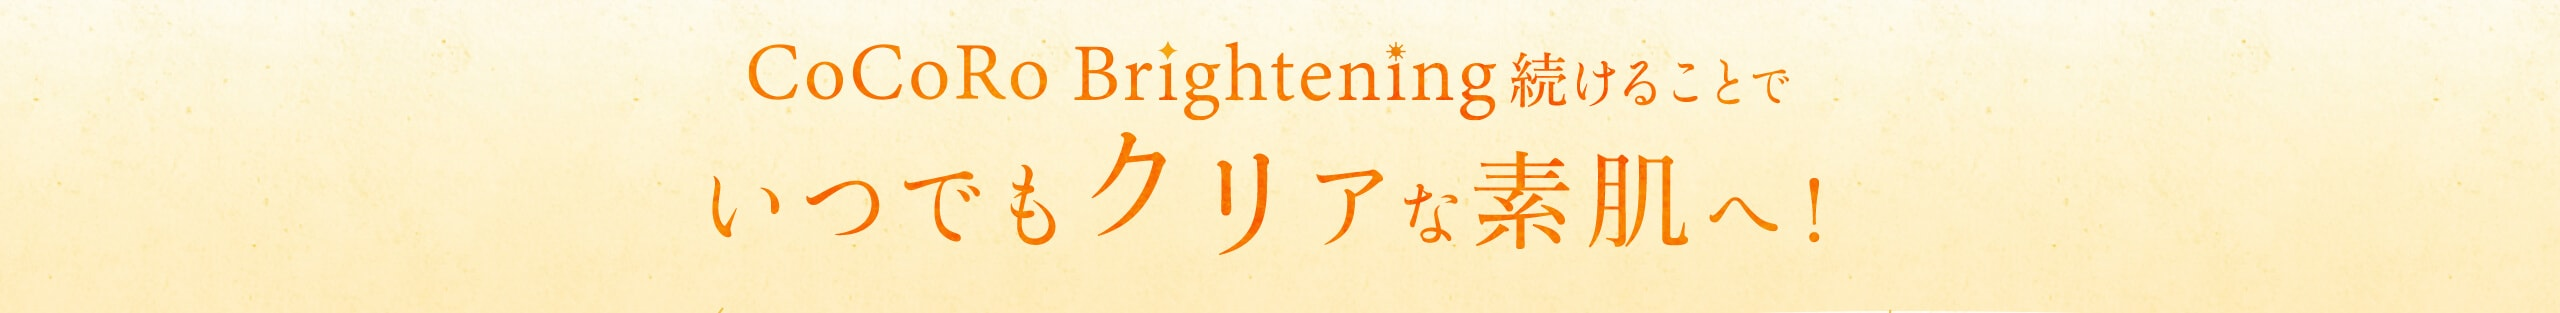 CoCoRoBrighteningを続けることでいつでもクリアな素肌へ!